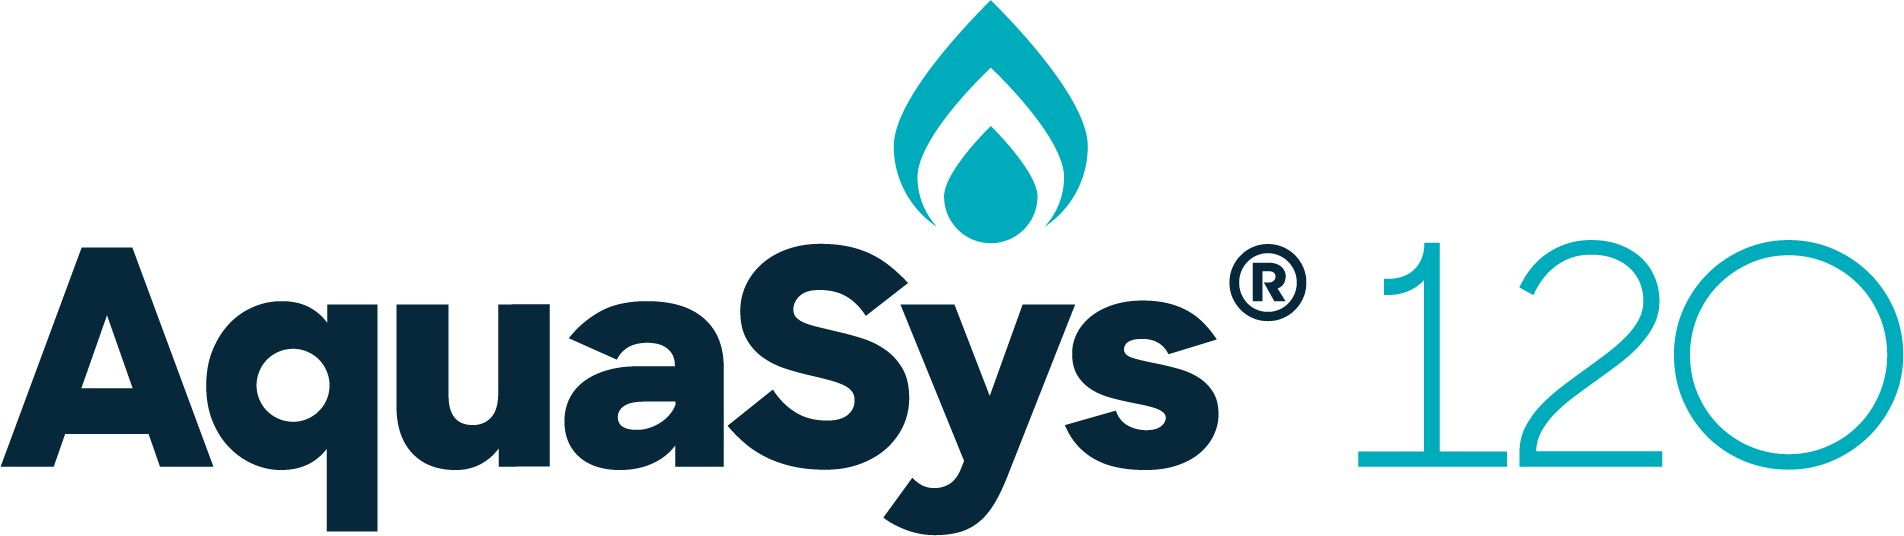 Aquasys 120 Logo